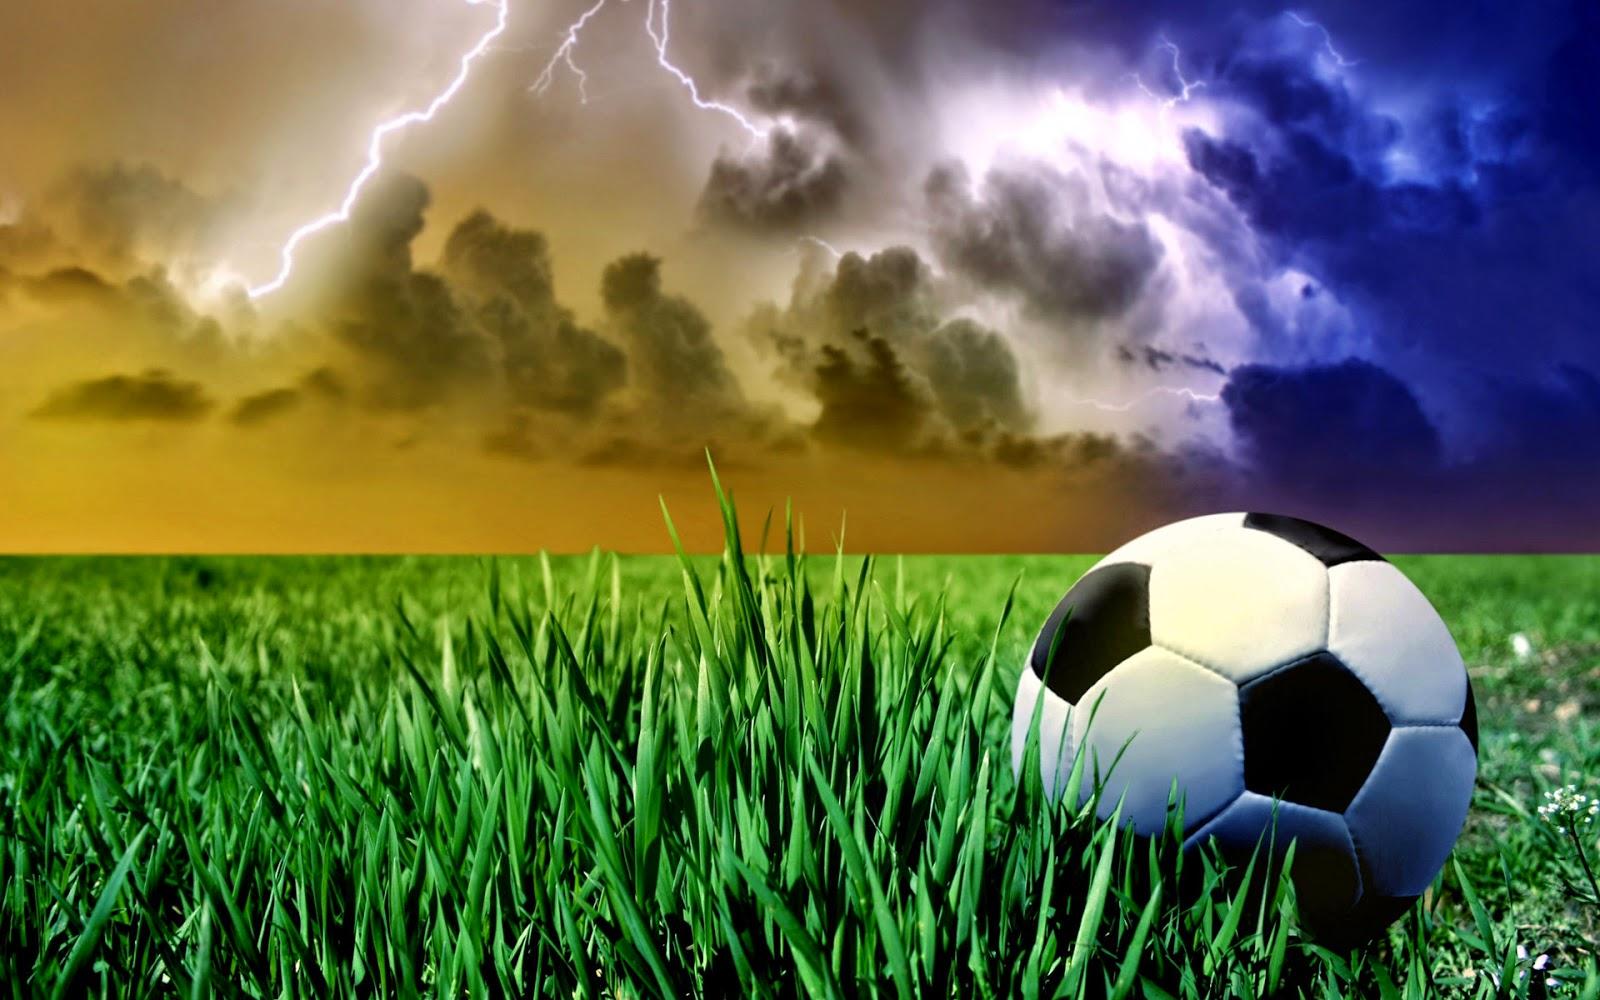 http://www.ozoneeleven.com/wp-content/uploads/2010/07/HD_Soccer_30.jpg